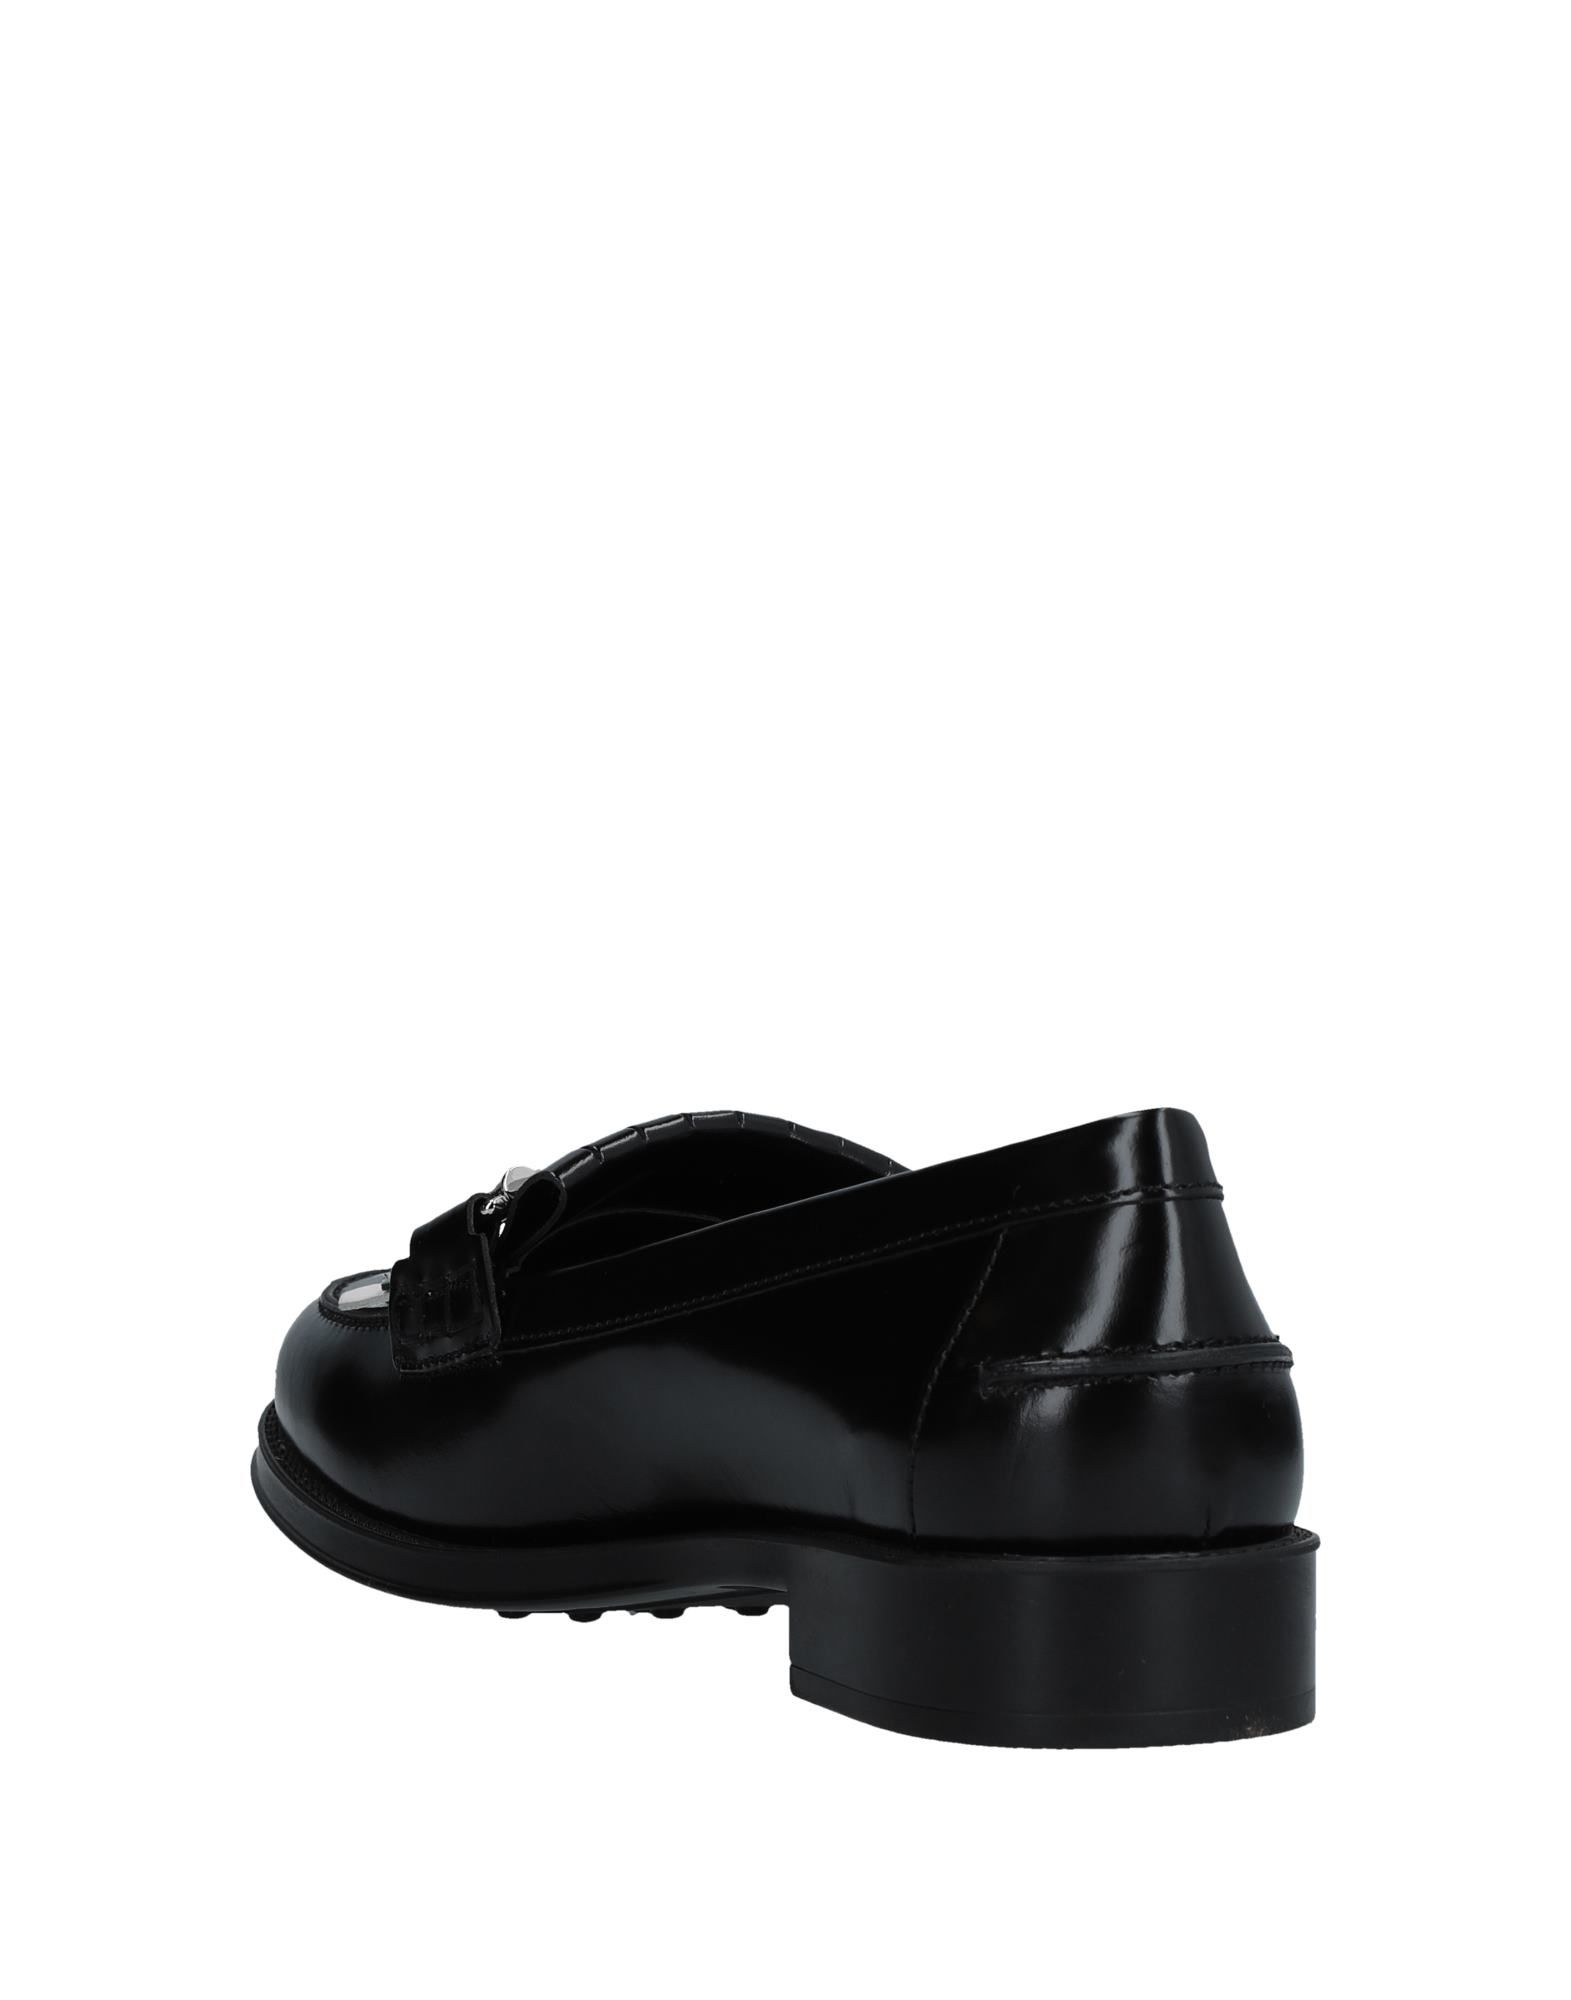 Tod's Tod's  Mokassins Damen  11542910IK Heiße Schuhe 770f4c